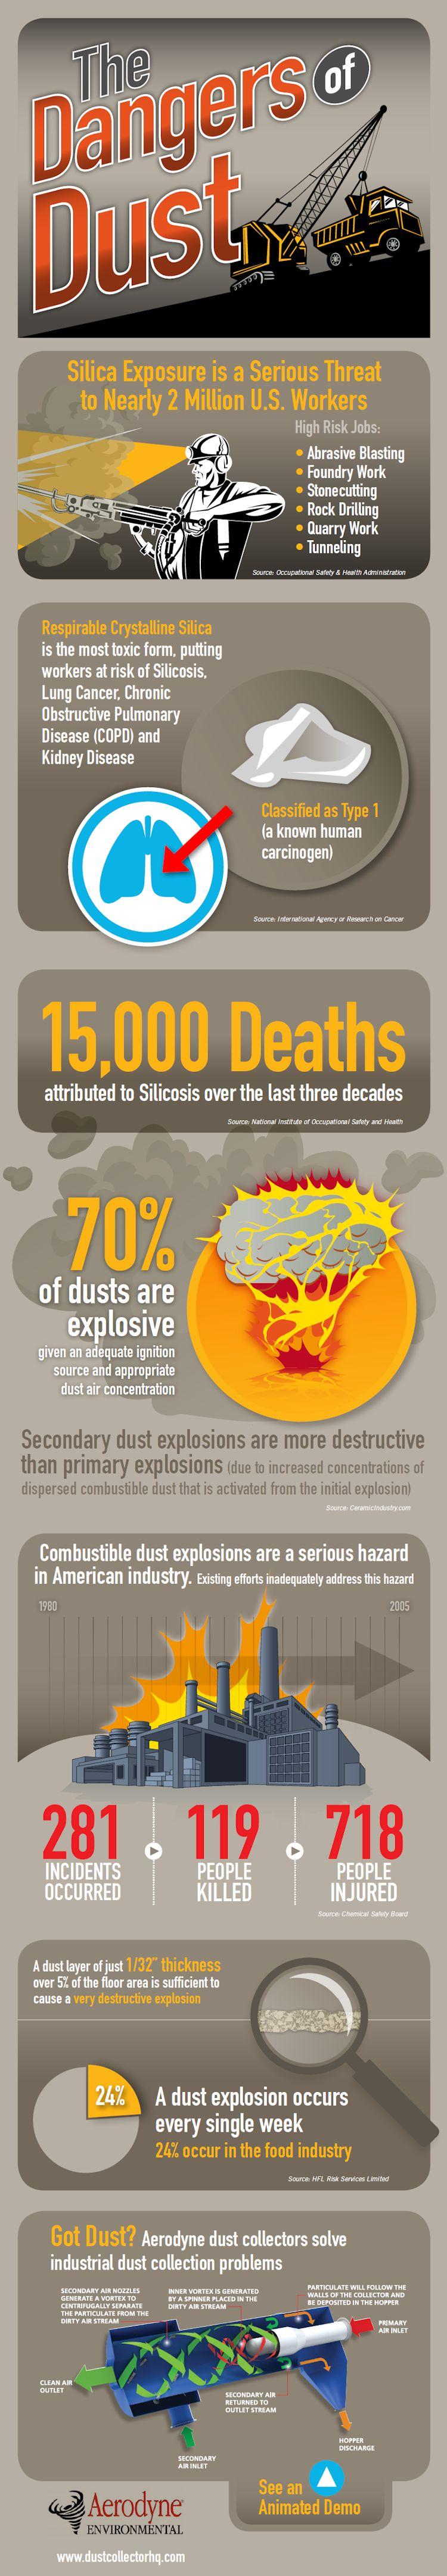 Industrial Dust Control Prevents Explosions & Serious Hazards: Part 2